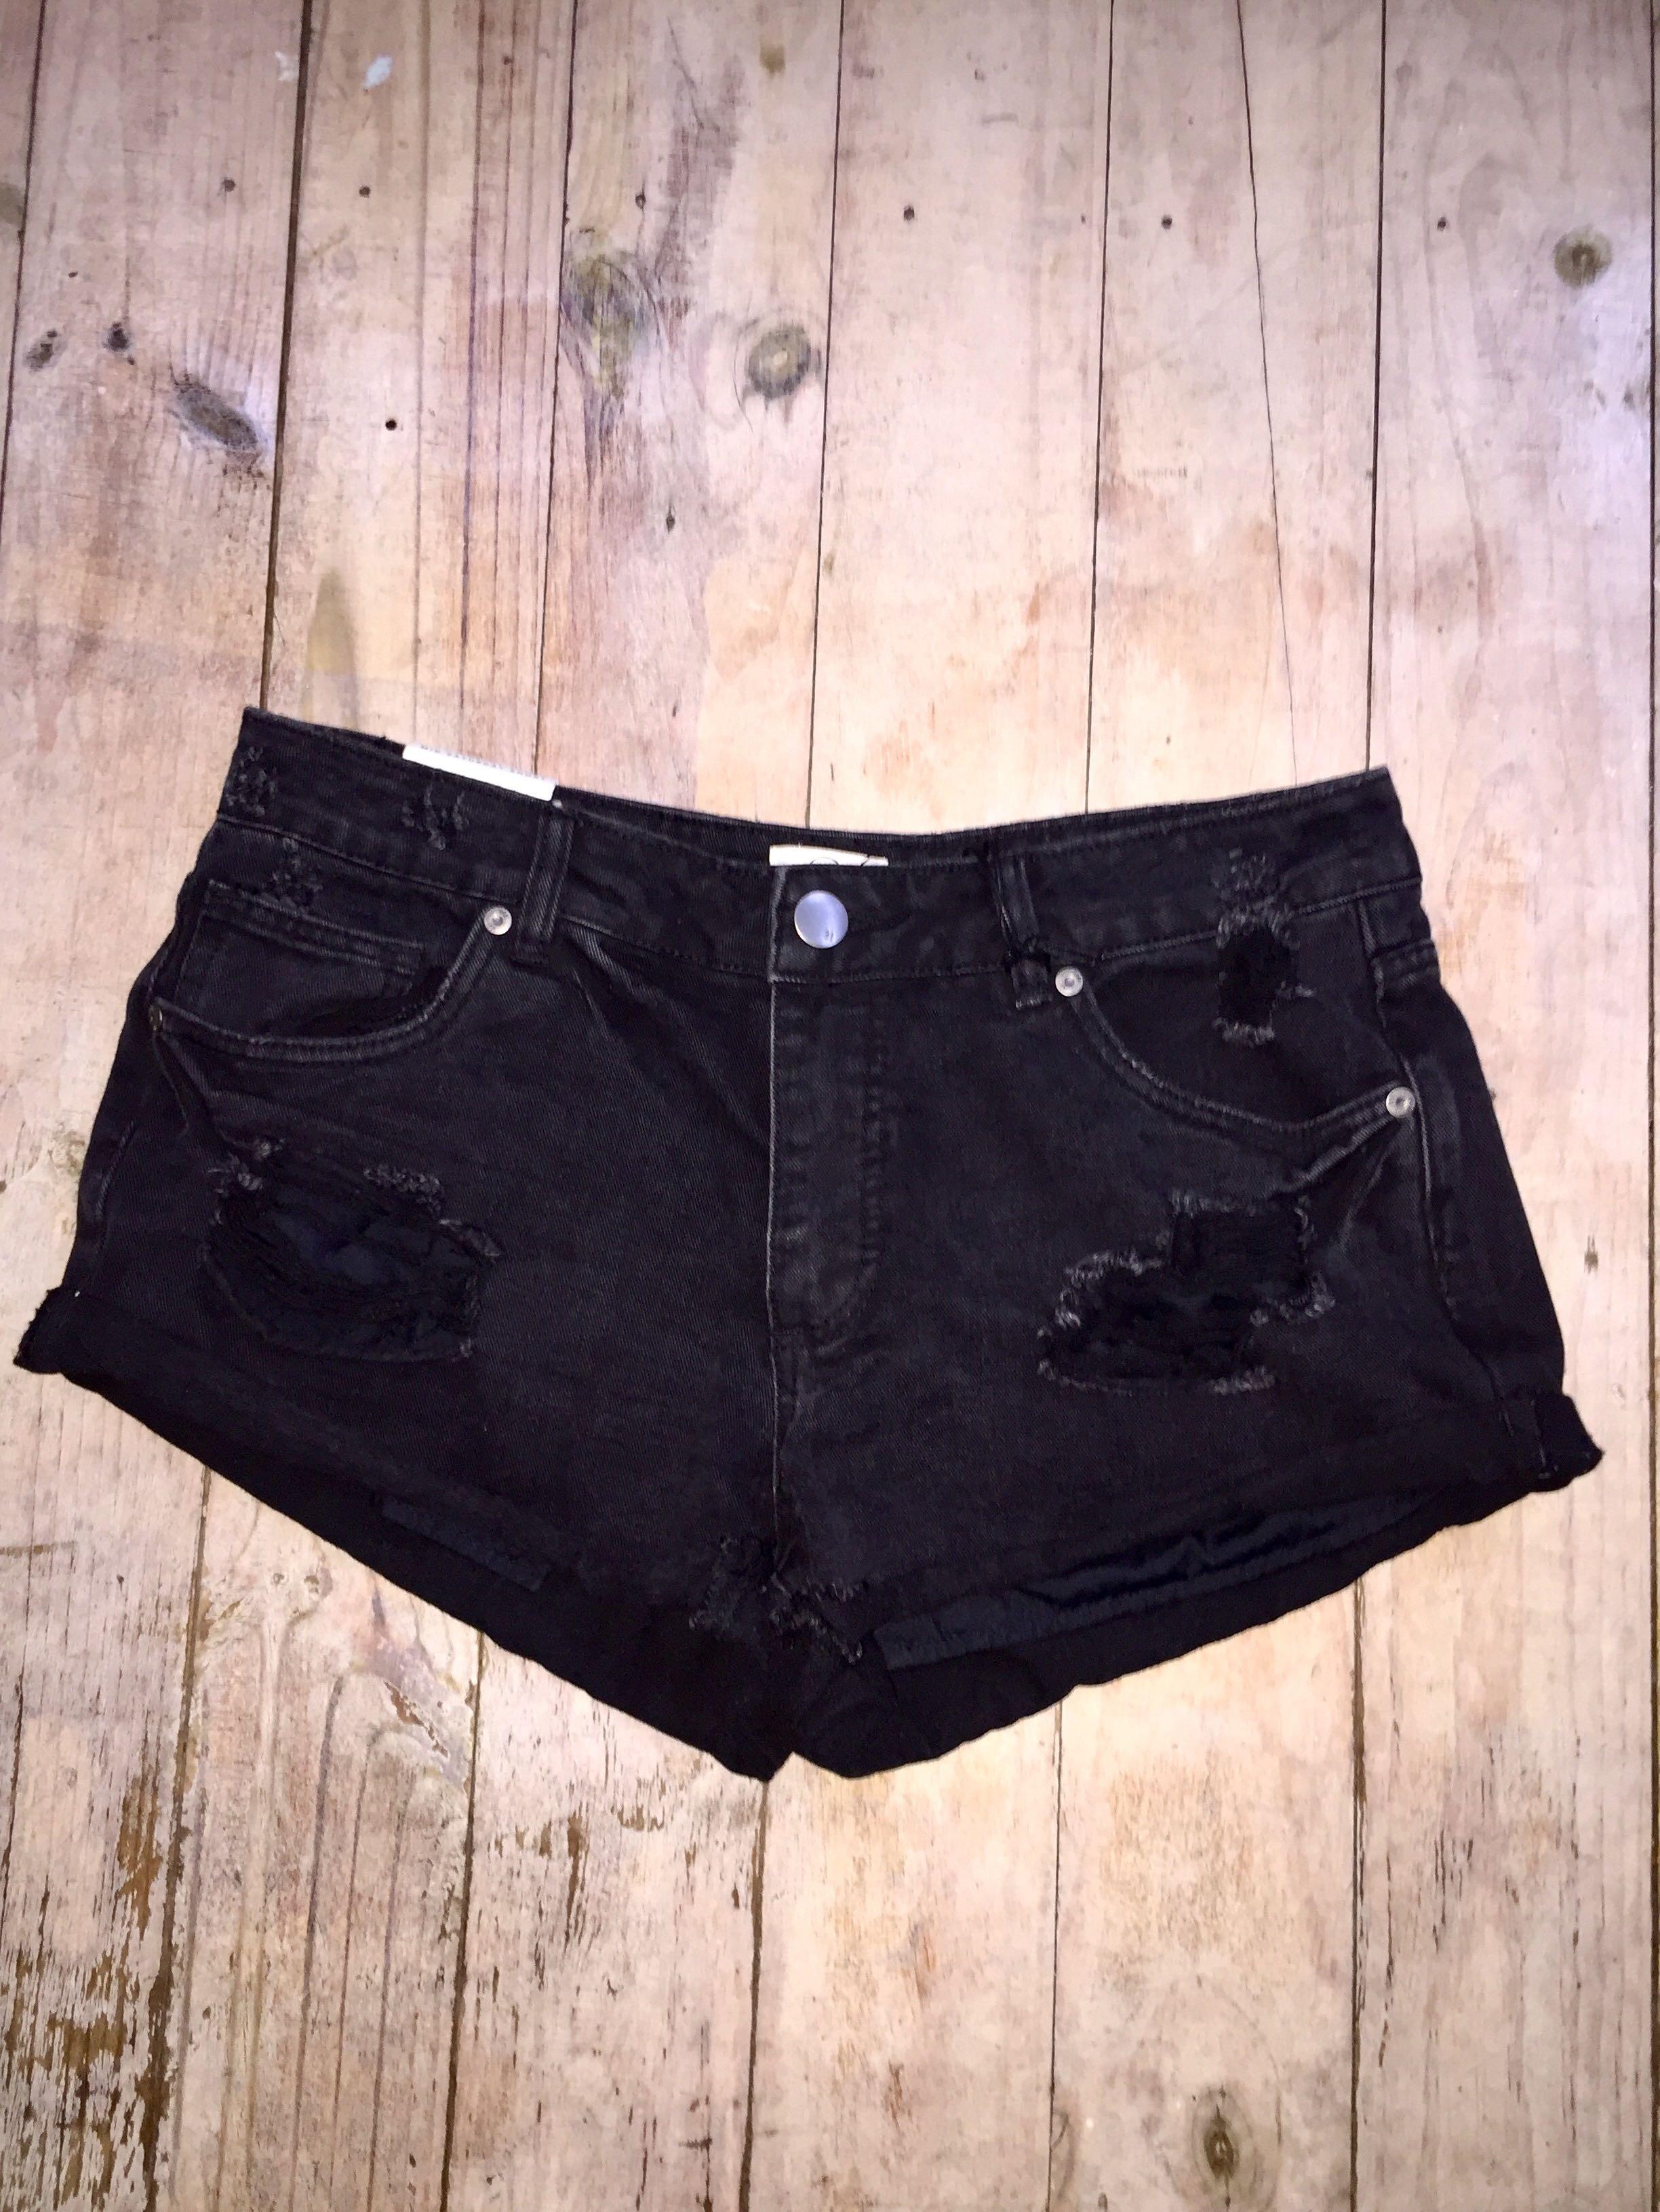 Ripped Dark Shorts